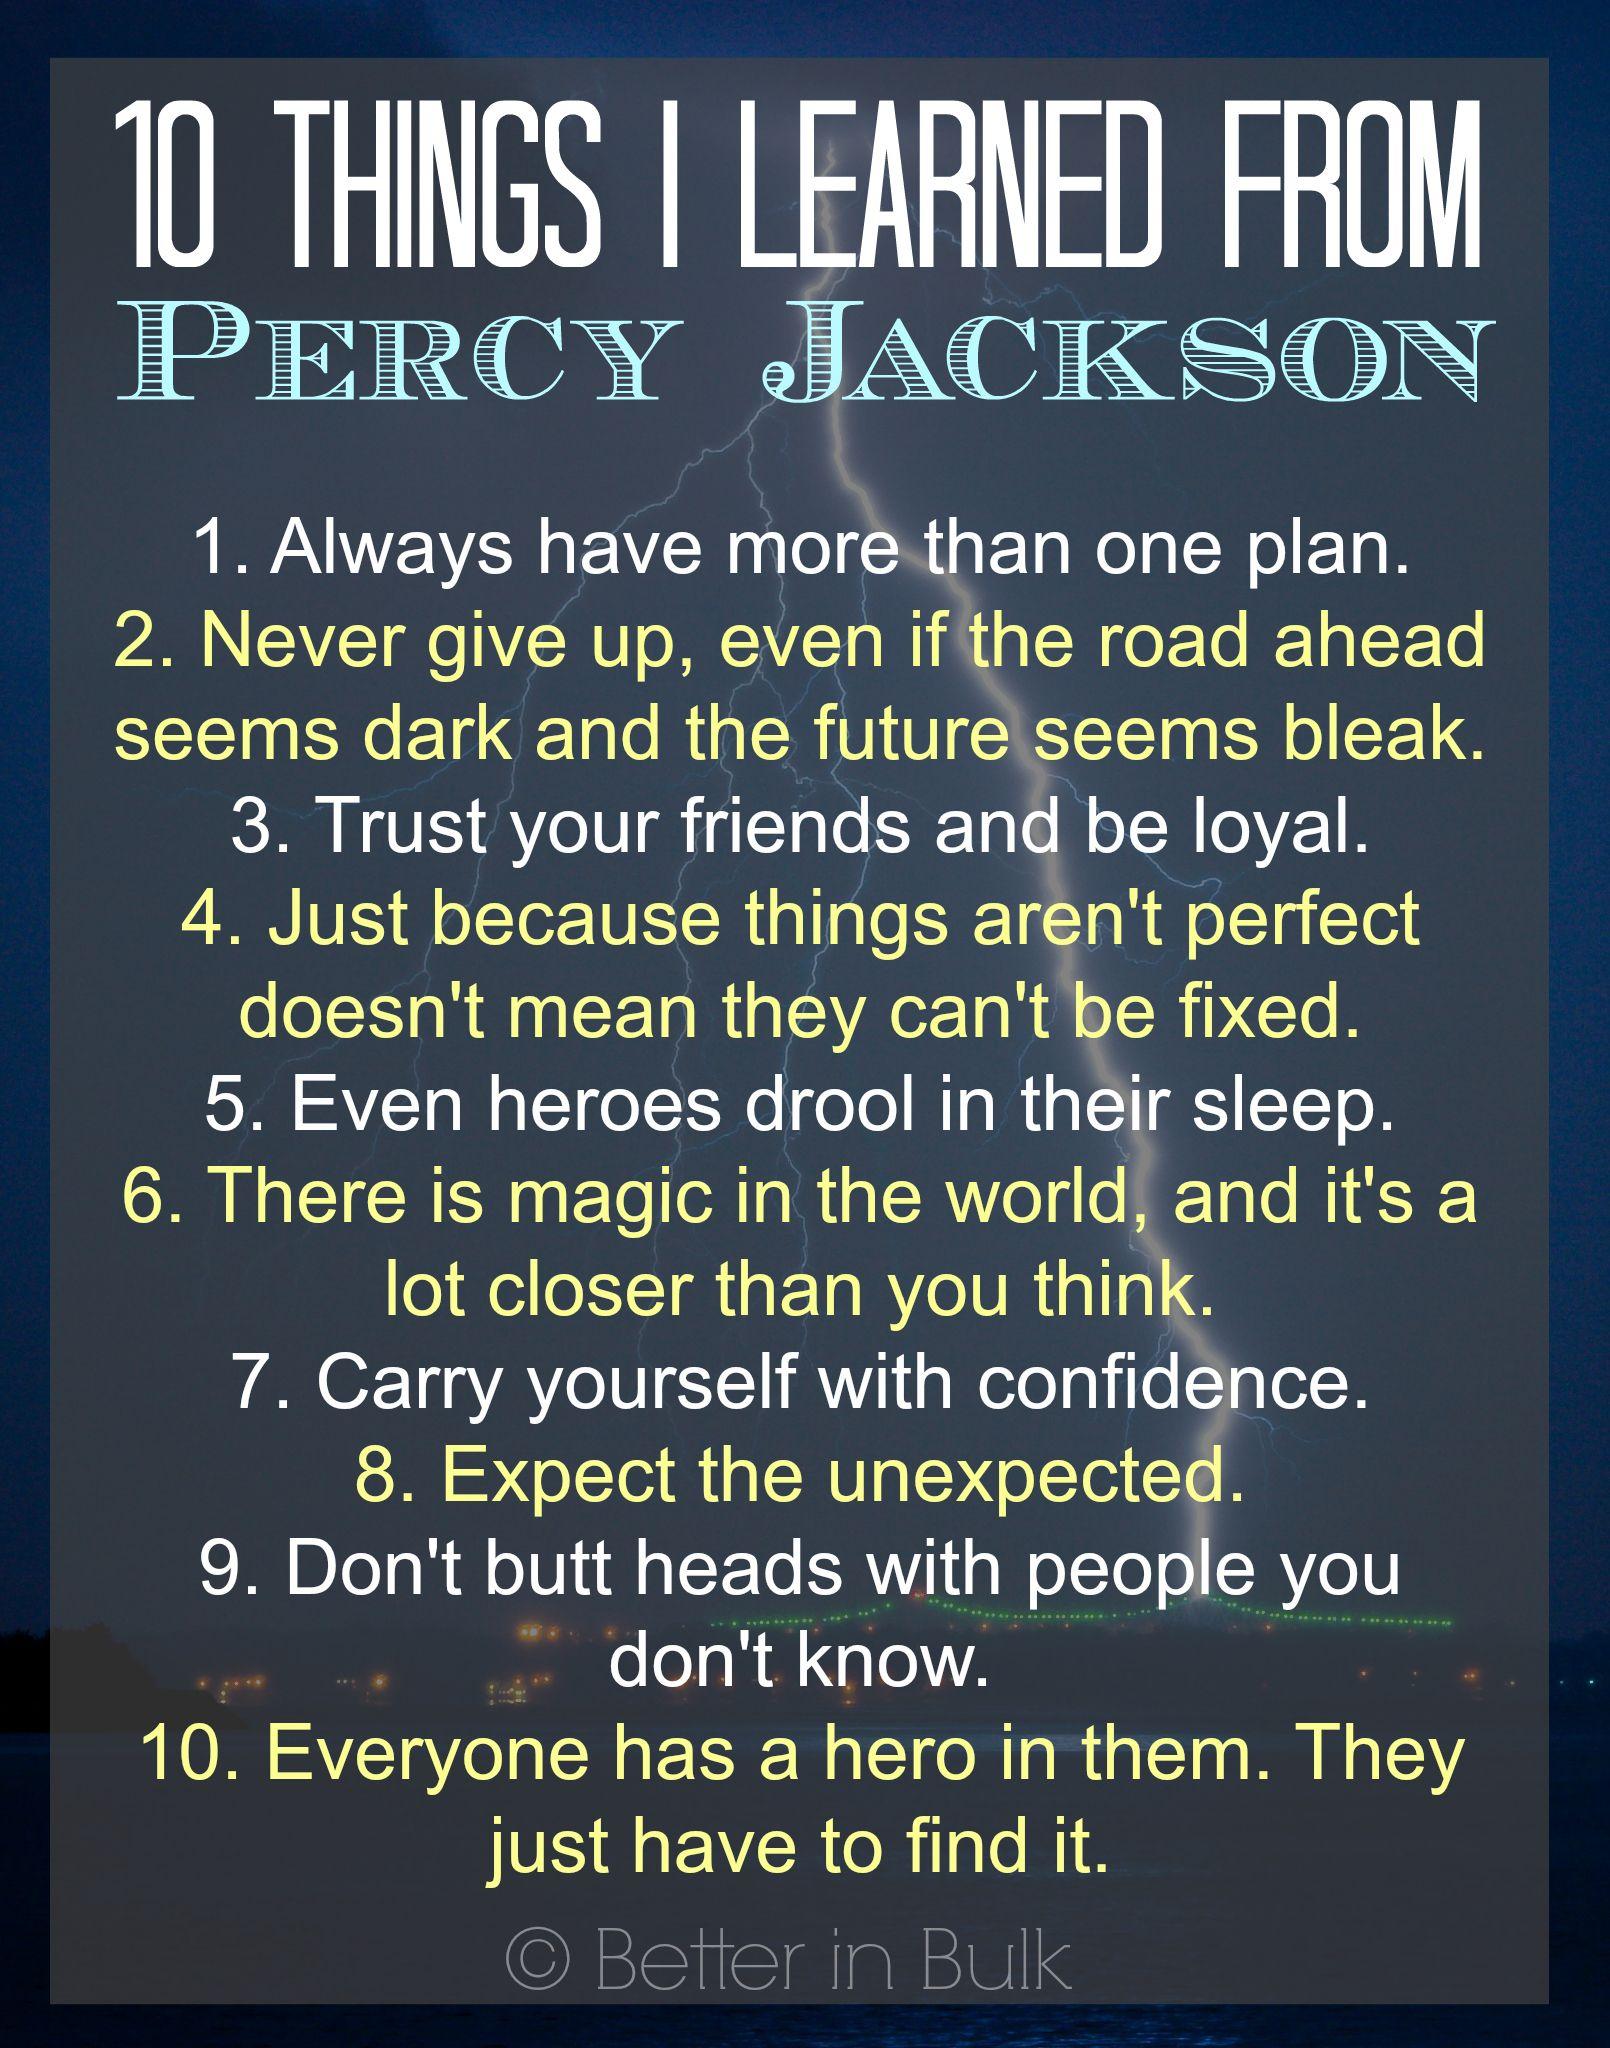 10 things i learned from percy jackson readriordan pinterest